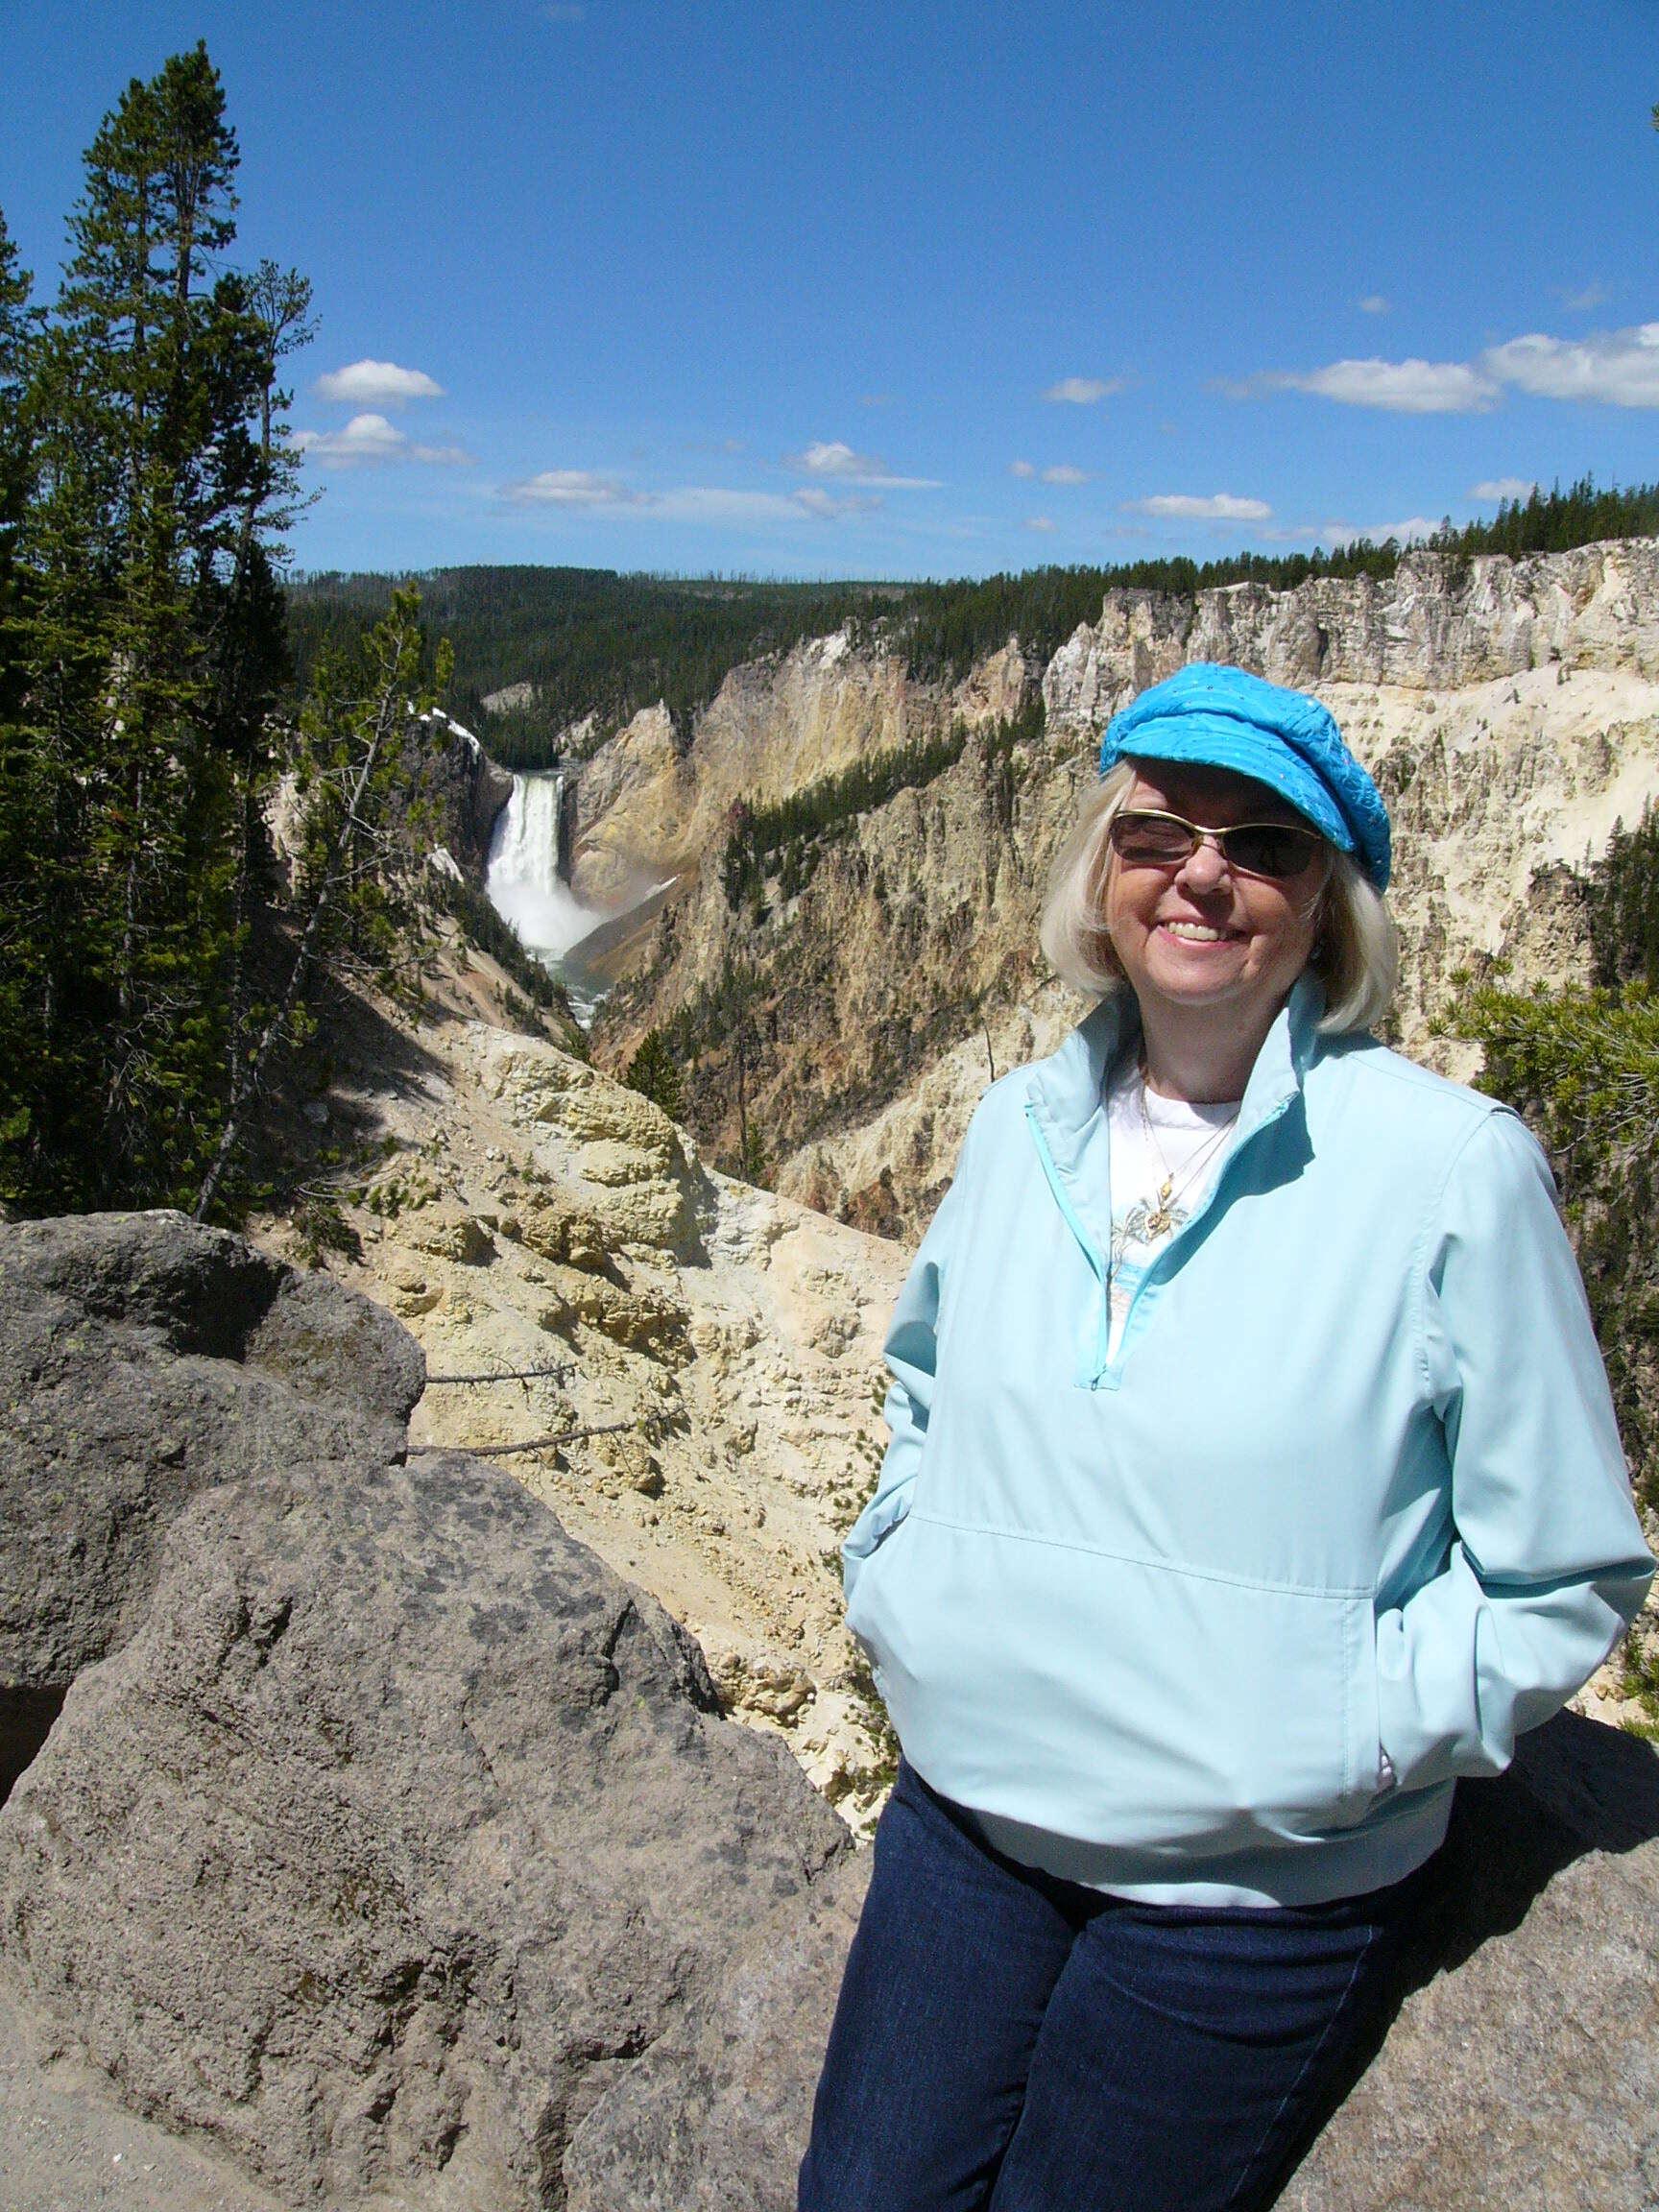 Travel agent Leona Karayan